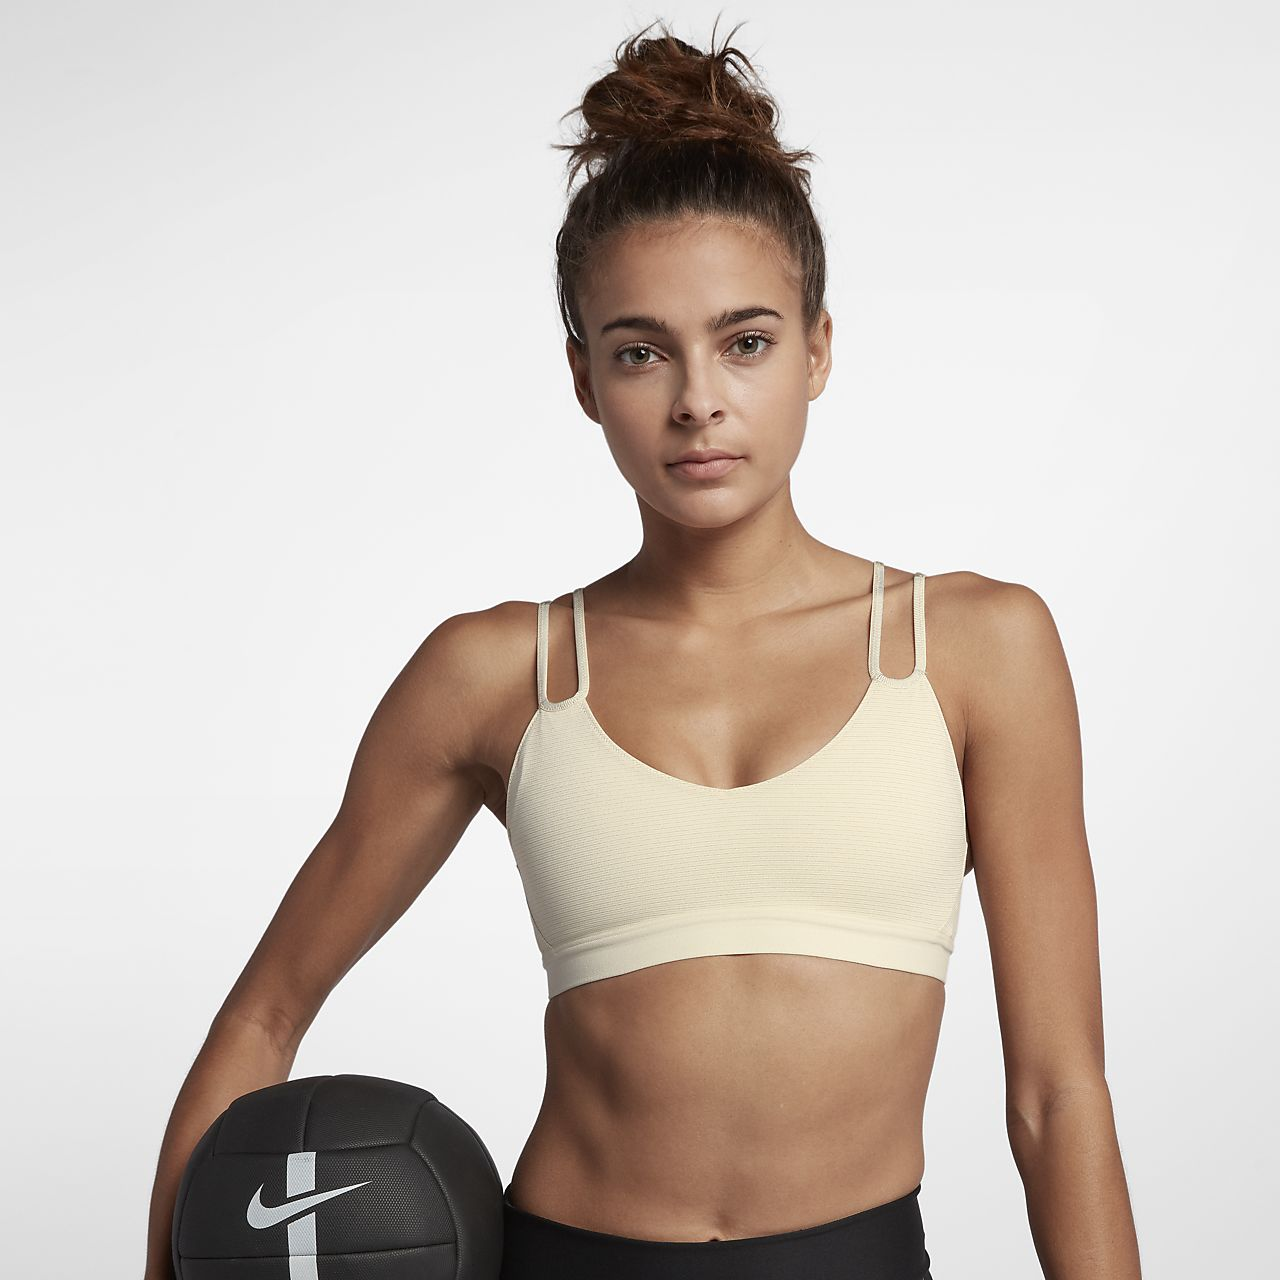 Nike Indy Sparkle Women's Light-Support Sports Bra